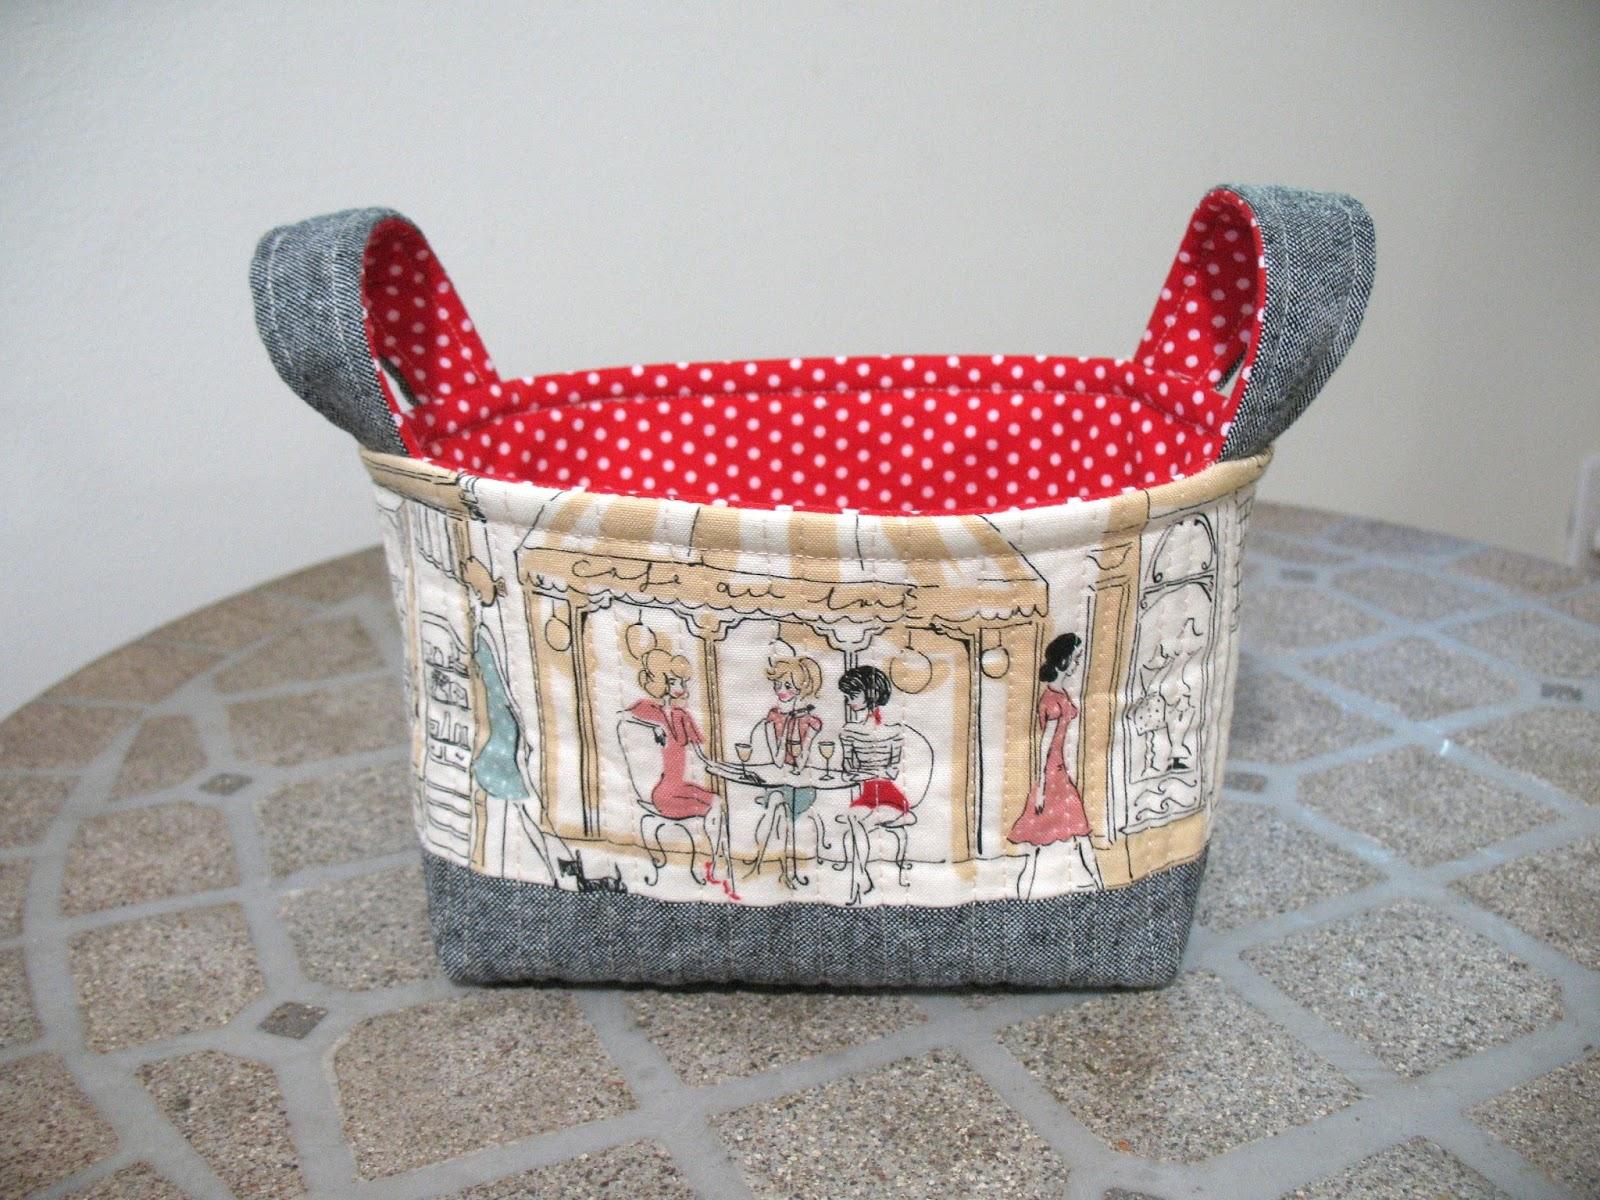 Ye Olde Sweatshop: Quilted Fabric Baskets